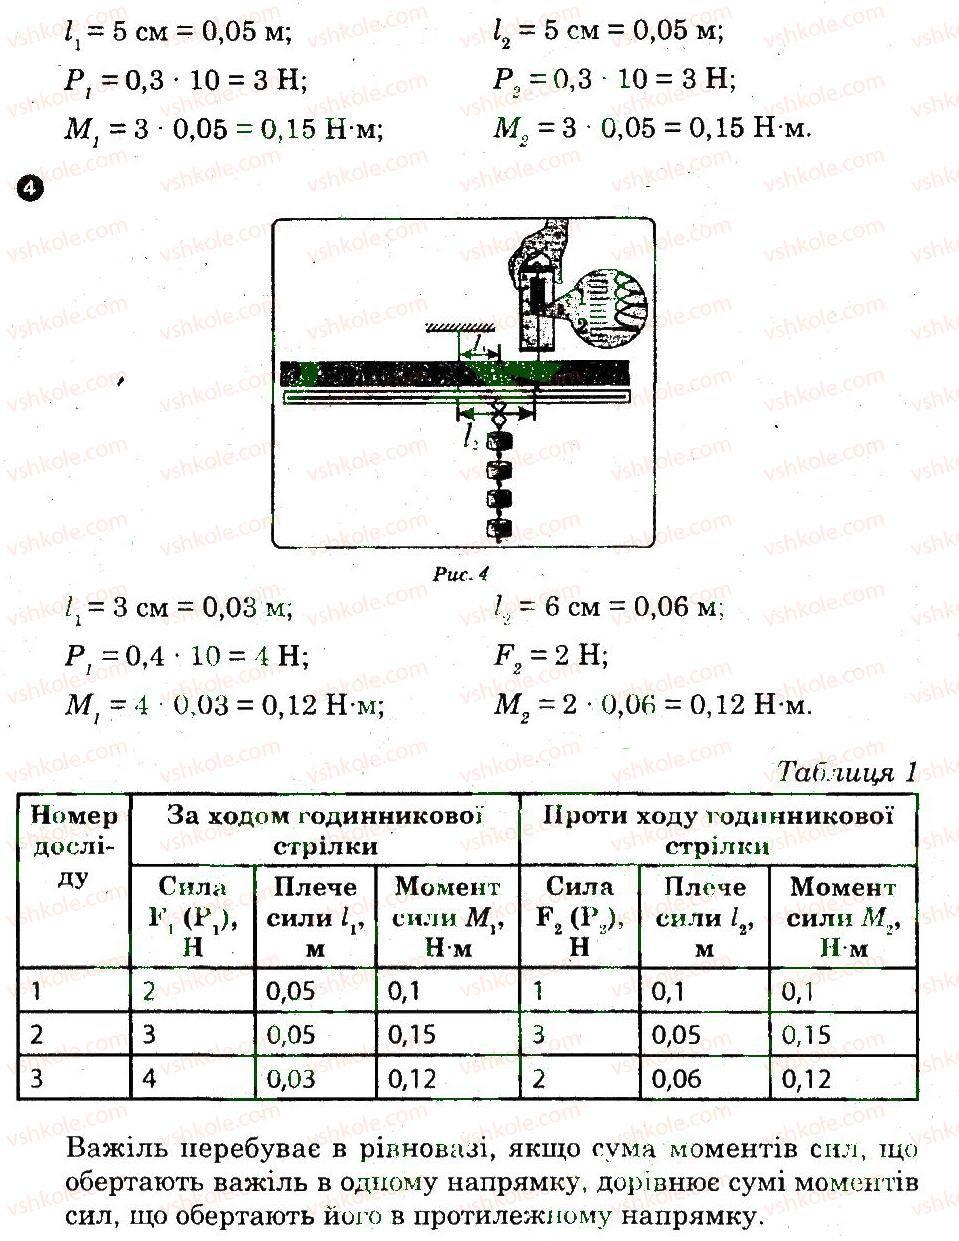 8-fizika-fya-bozhinova-oo-kiryuhina-2010-zoshit-dlya-laboratornih-robit--laboratorni-roboti-8-rnd2802.jpg